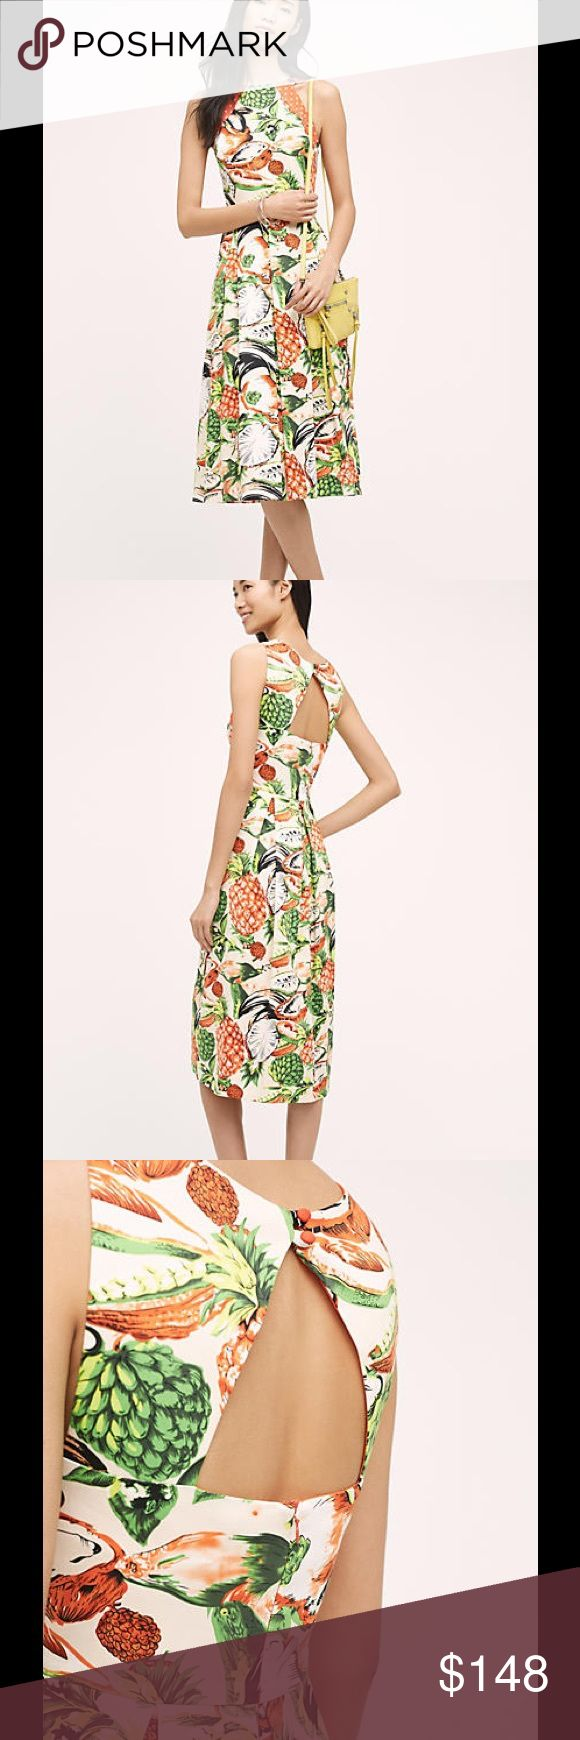 Eva Franco Pineapple Halter Dress Cotton, elastane Fit-and-flare silhouette Side zip Dry clean Made in USA Eva Franco Dresses Midi